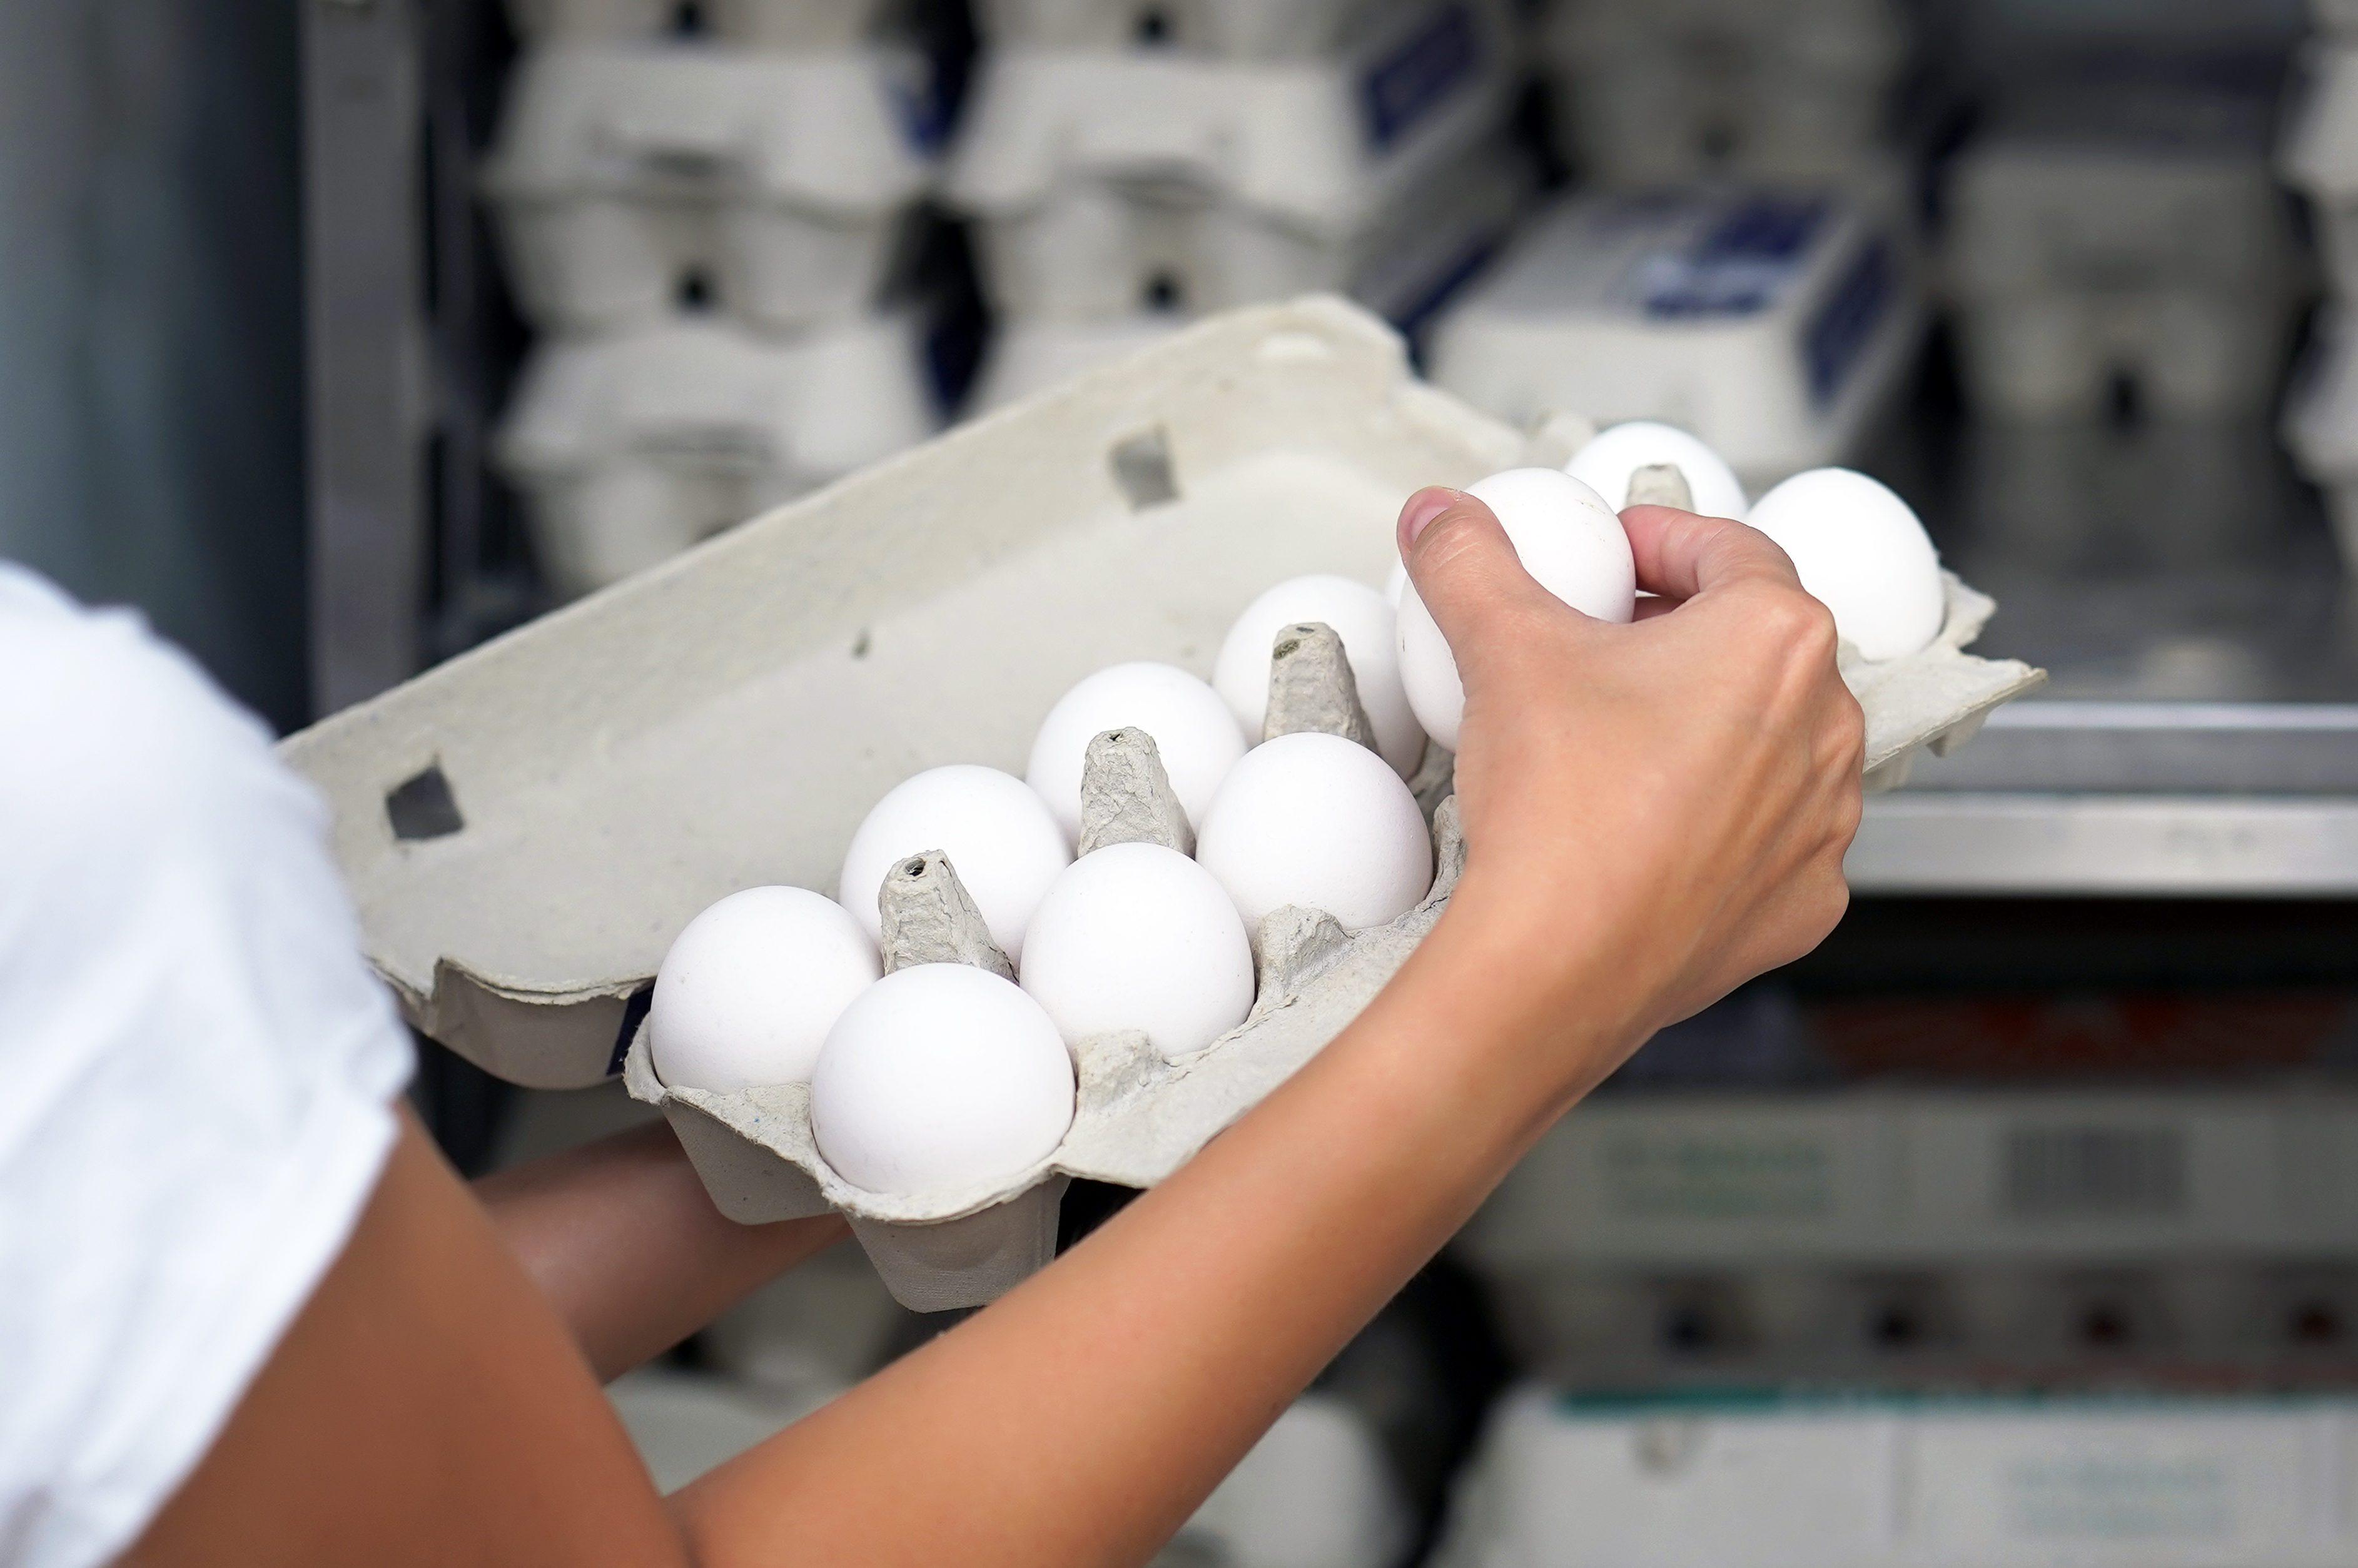 Woman buys eggs